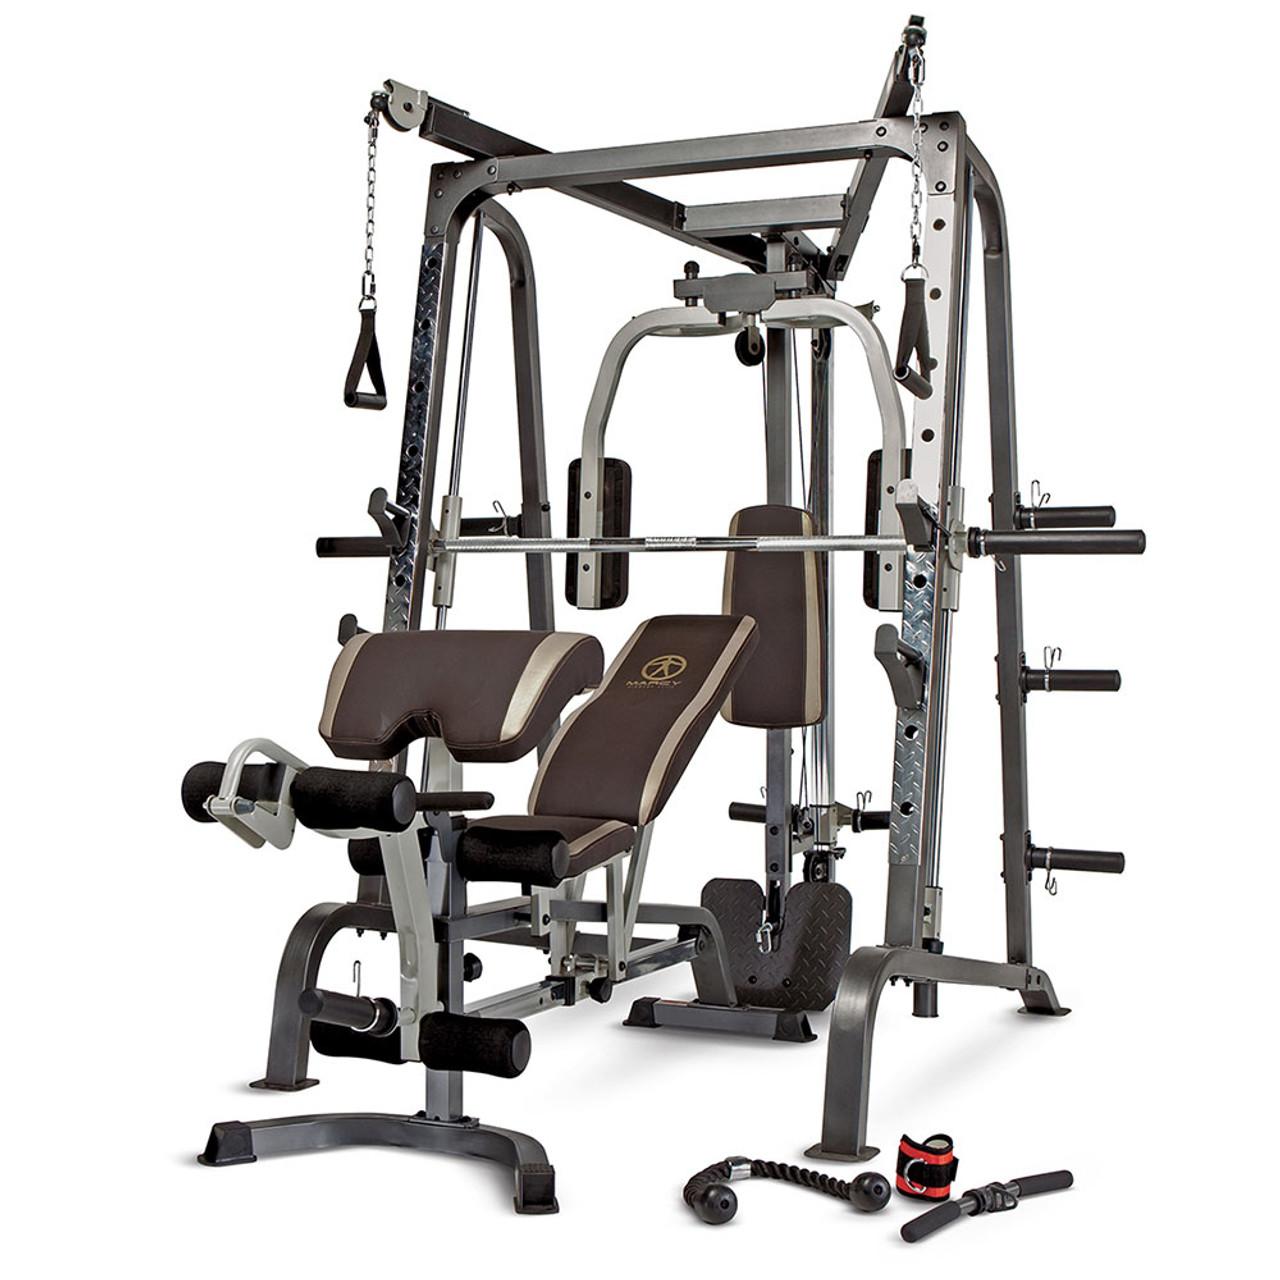 The Best Quality Brand Smith Machine Home Gym MD9010G Marcy Pro